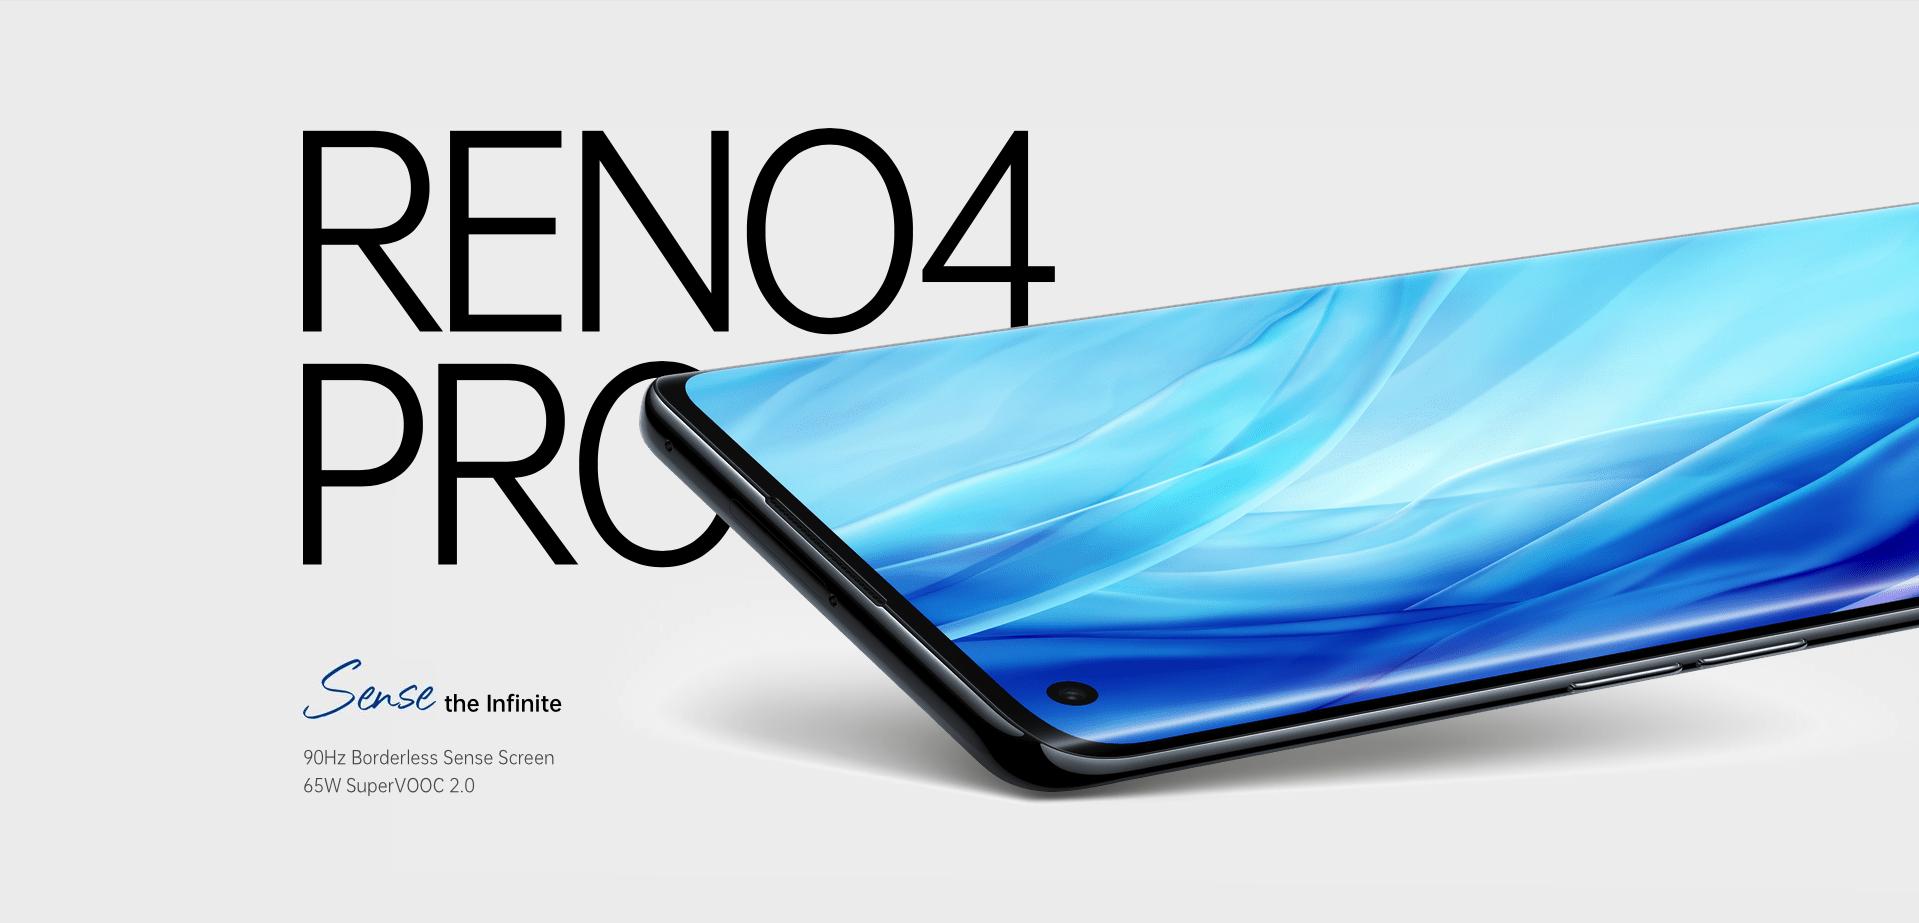 OPPO Reno4 Pro представлен на глобальном рынке: AMOLED-дисплей на 90 Гц, чип Snapdragon 720G, квадро-камера и ценник в $468